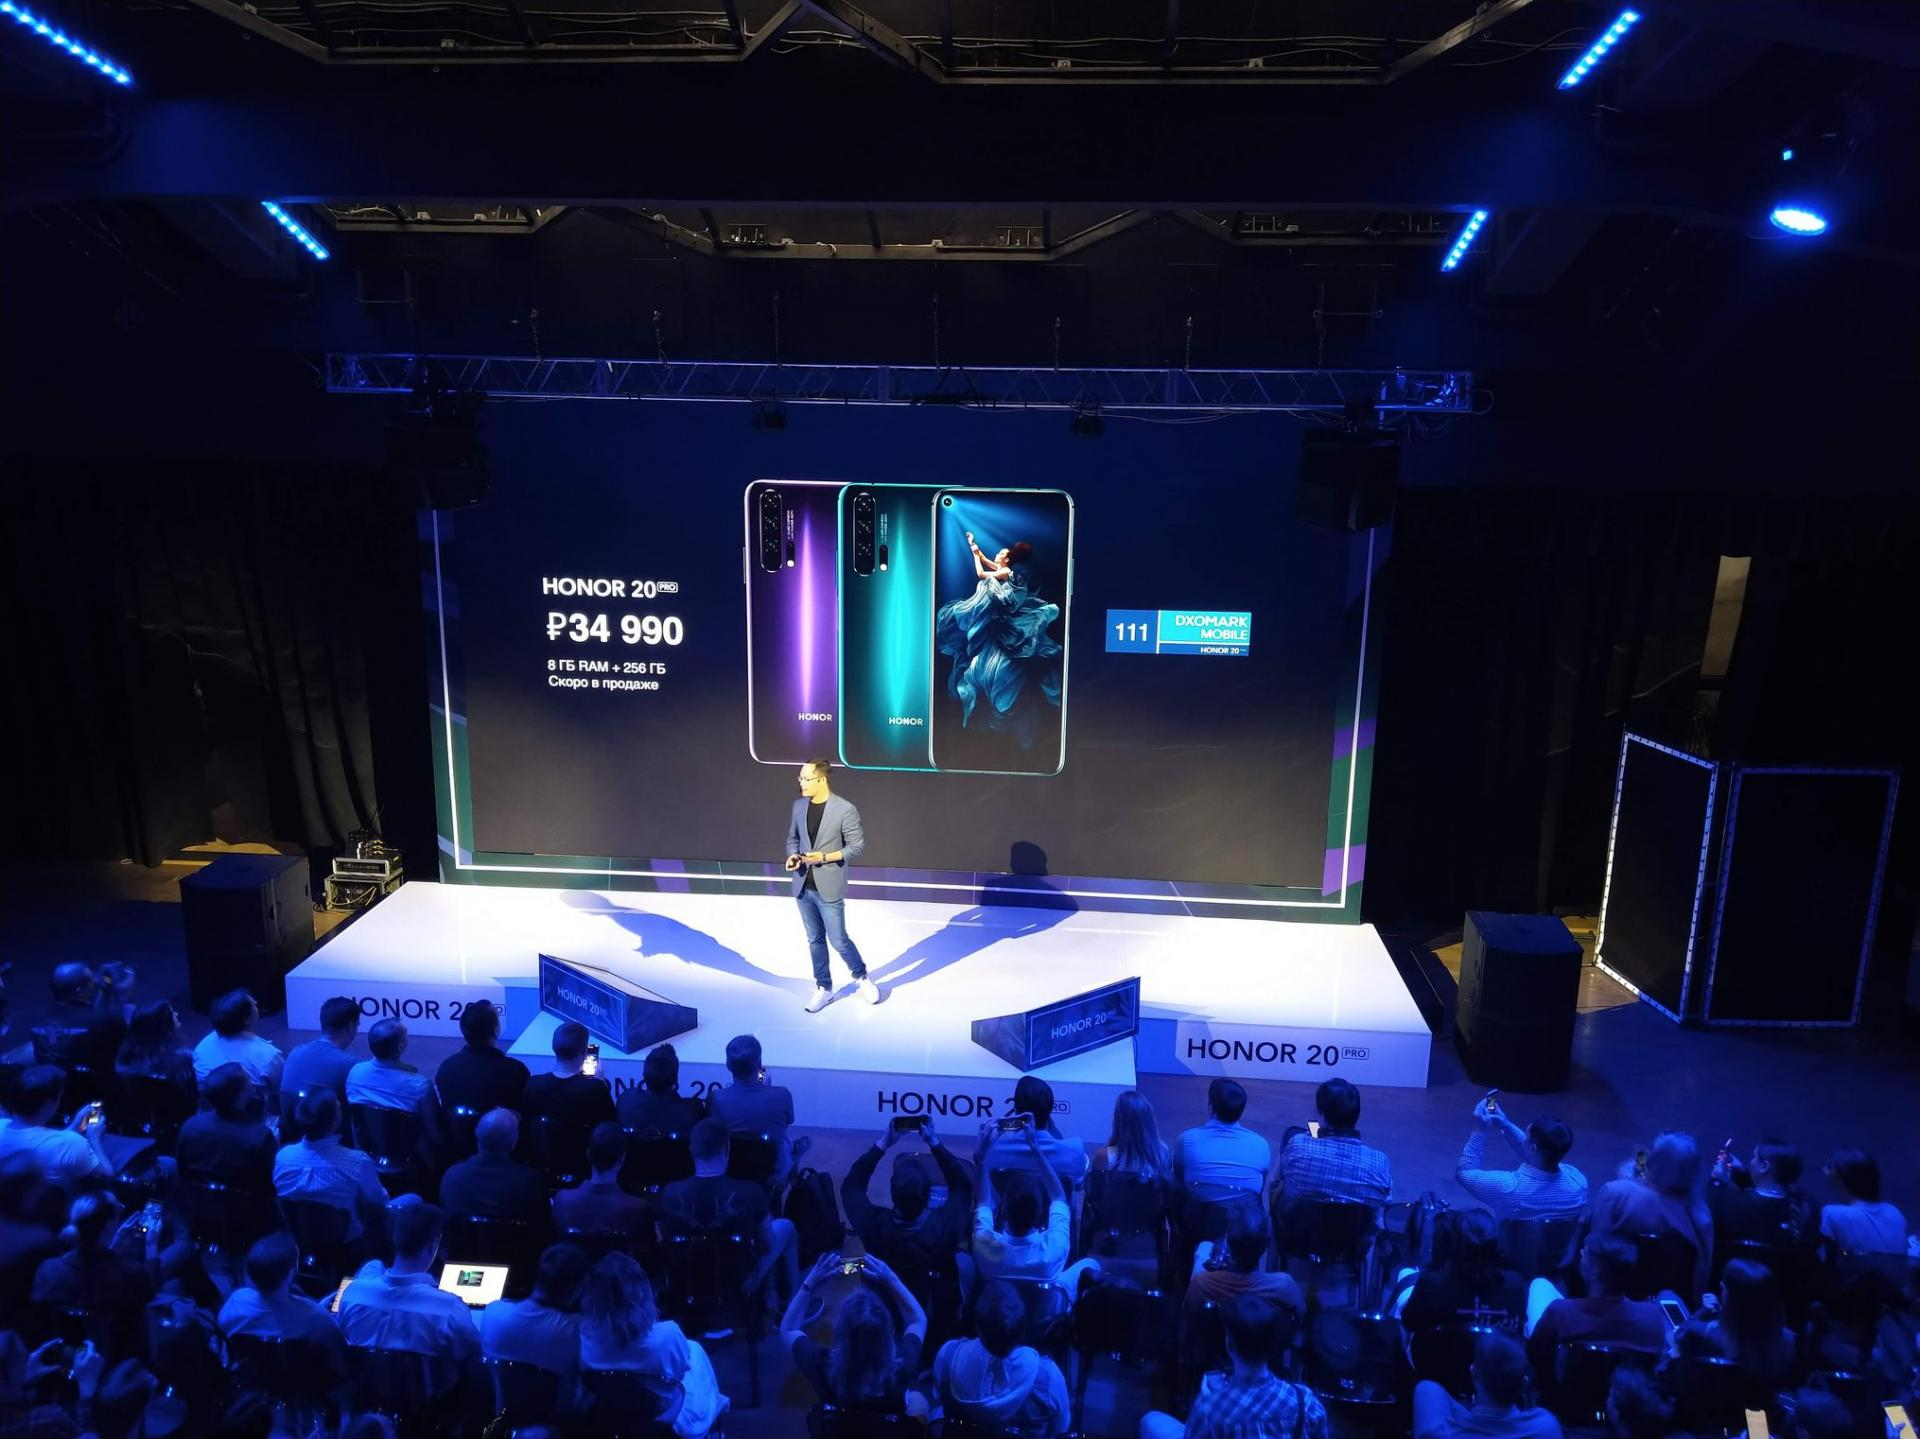 Засмартфон Honor 20 Pro просят 34990 рублей